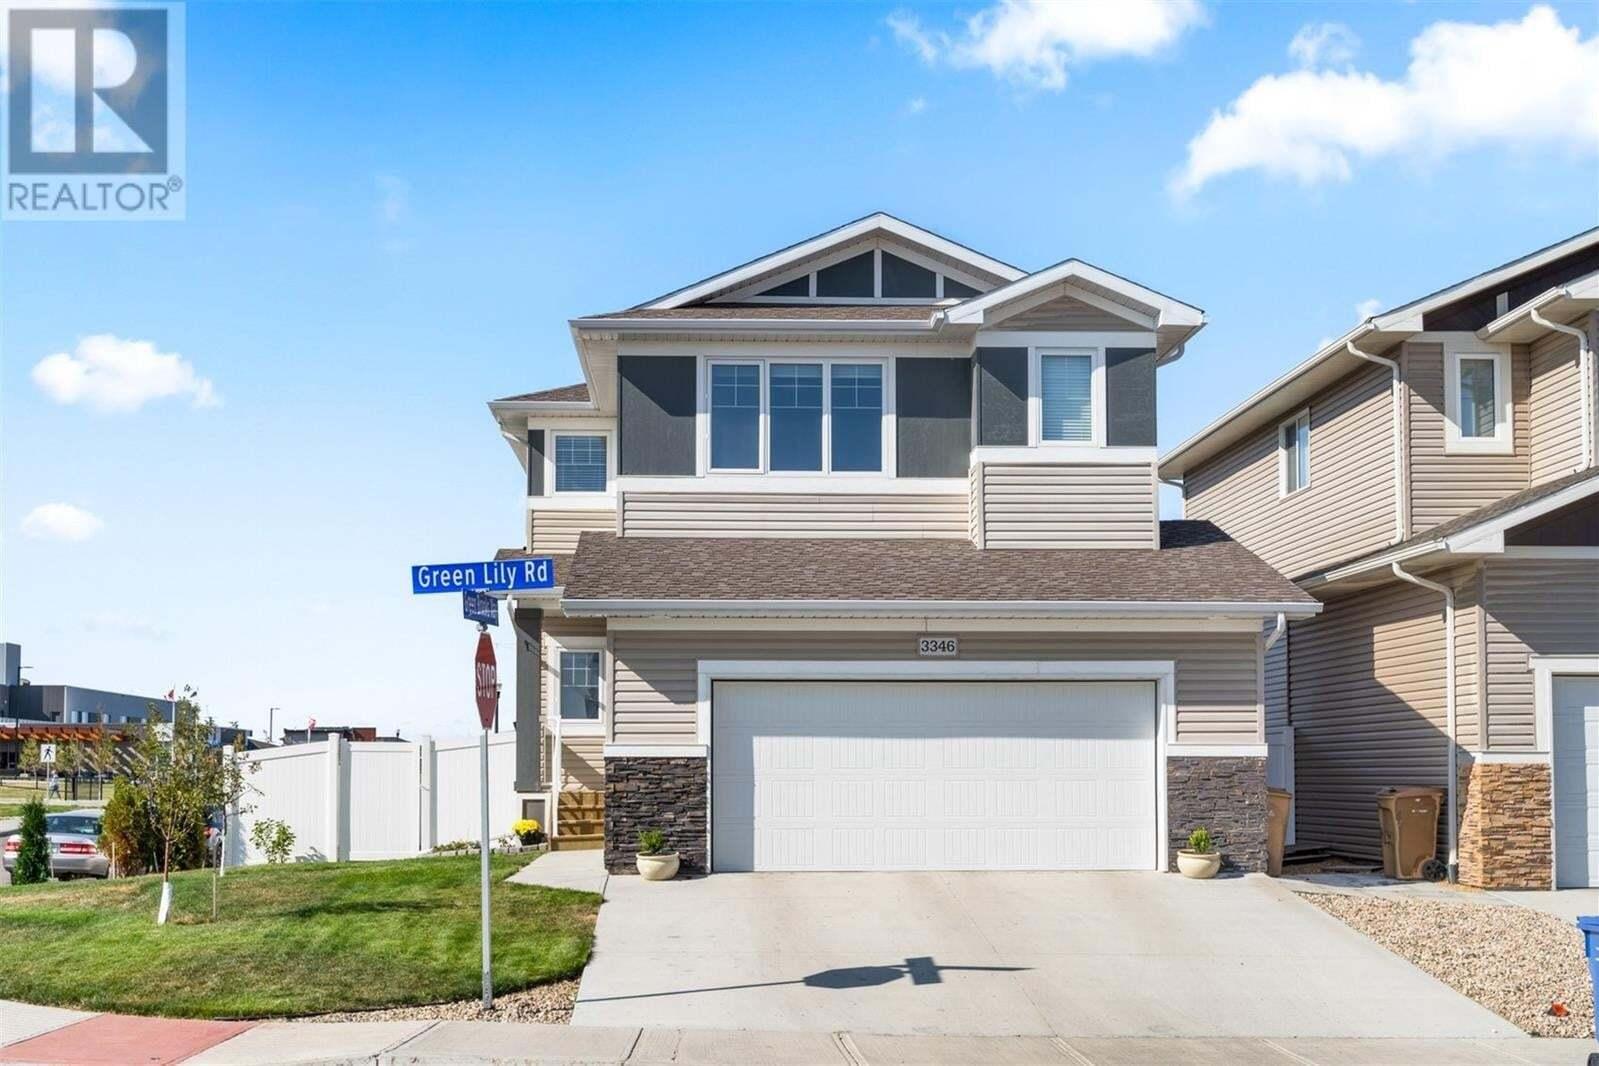 House for sale at 3346 Green Lily Rd Regina Saskatchewan - MLS: SK827501